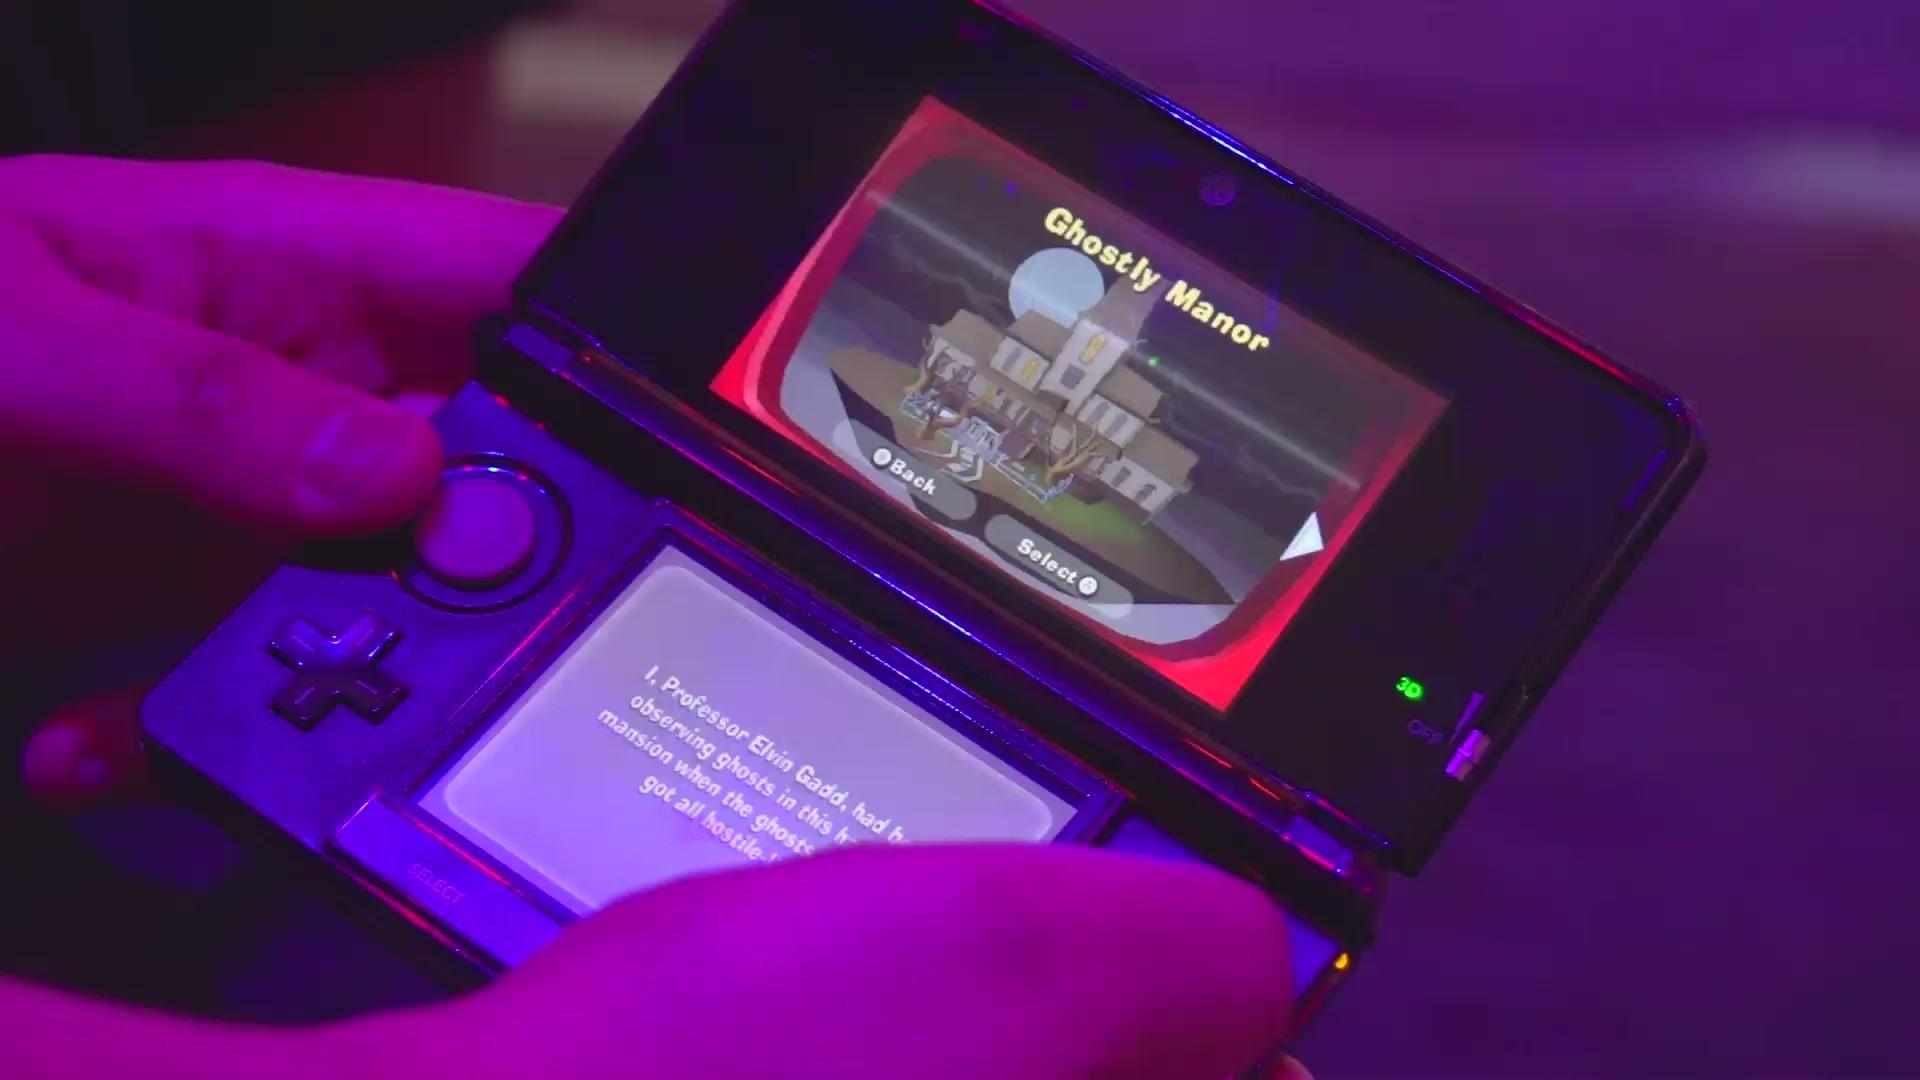 1920x1080 Here's some gameplay we shot of Luigi's Mansion: Dark Moon, the sequel to